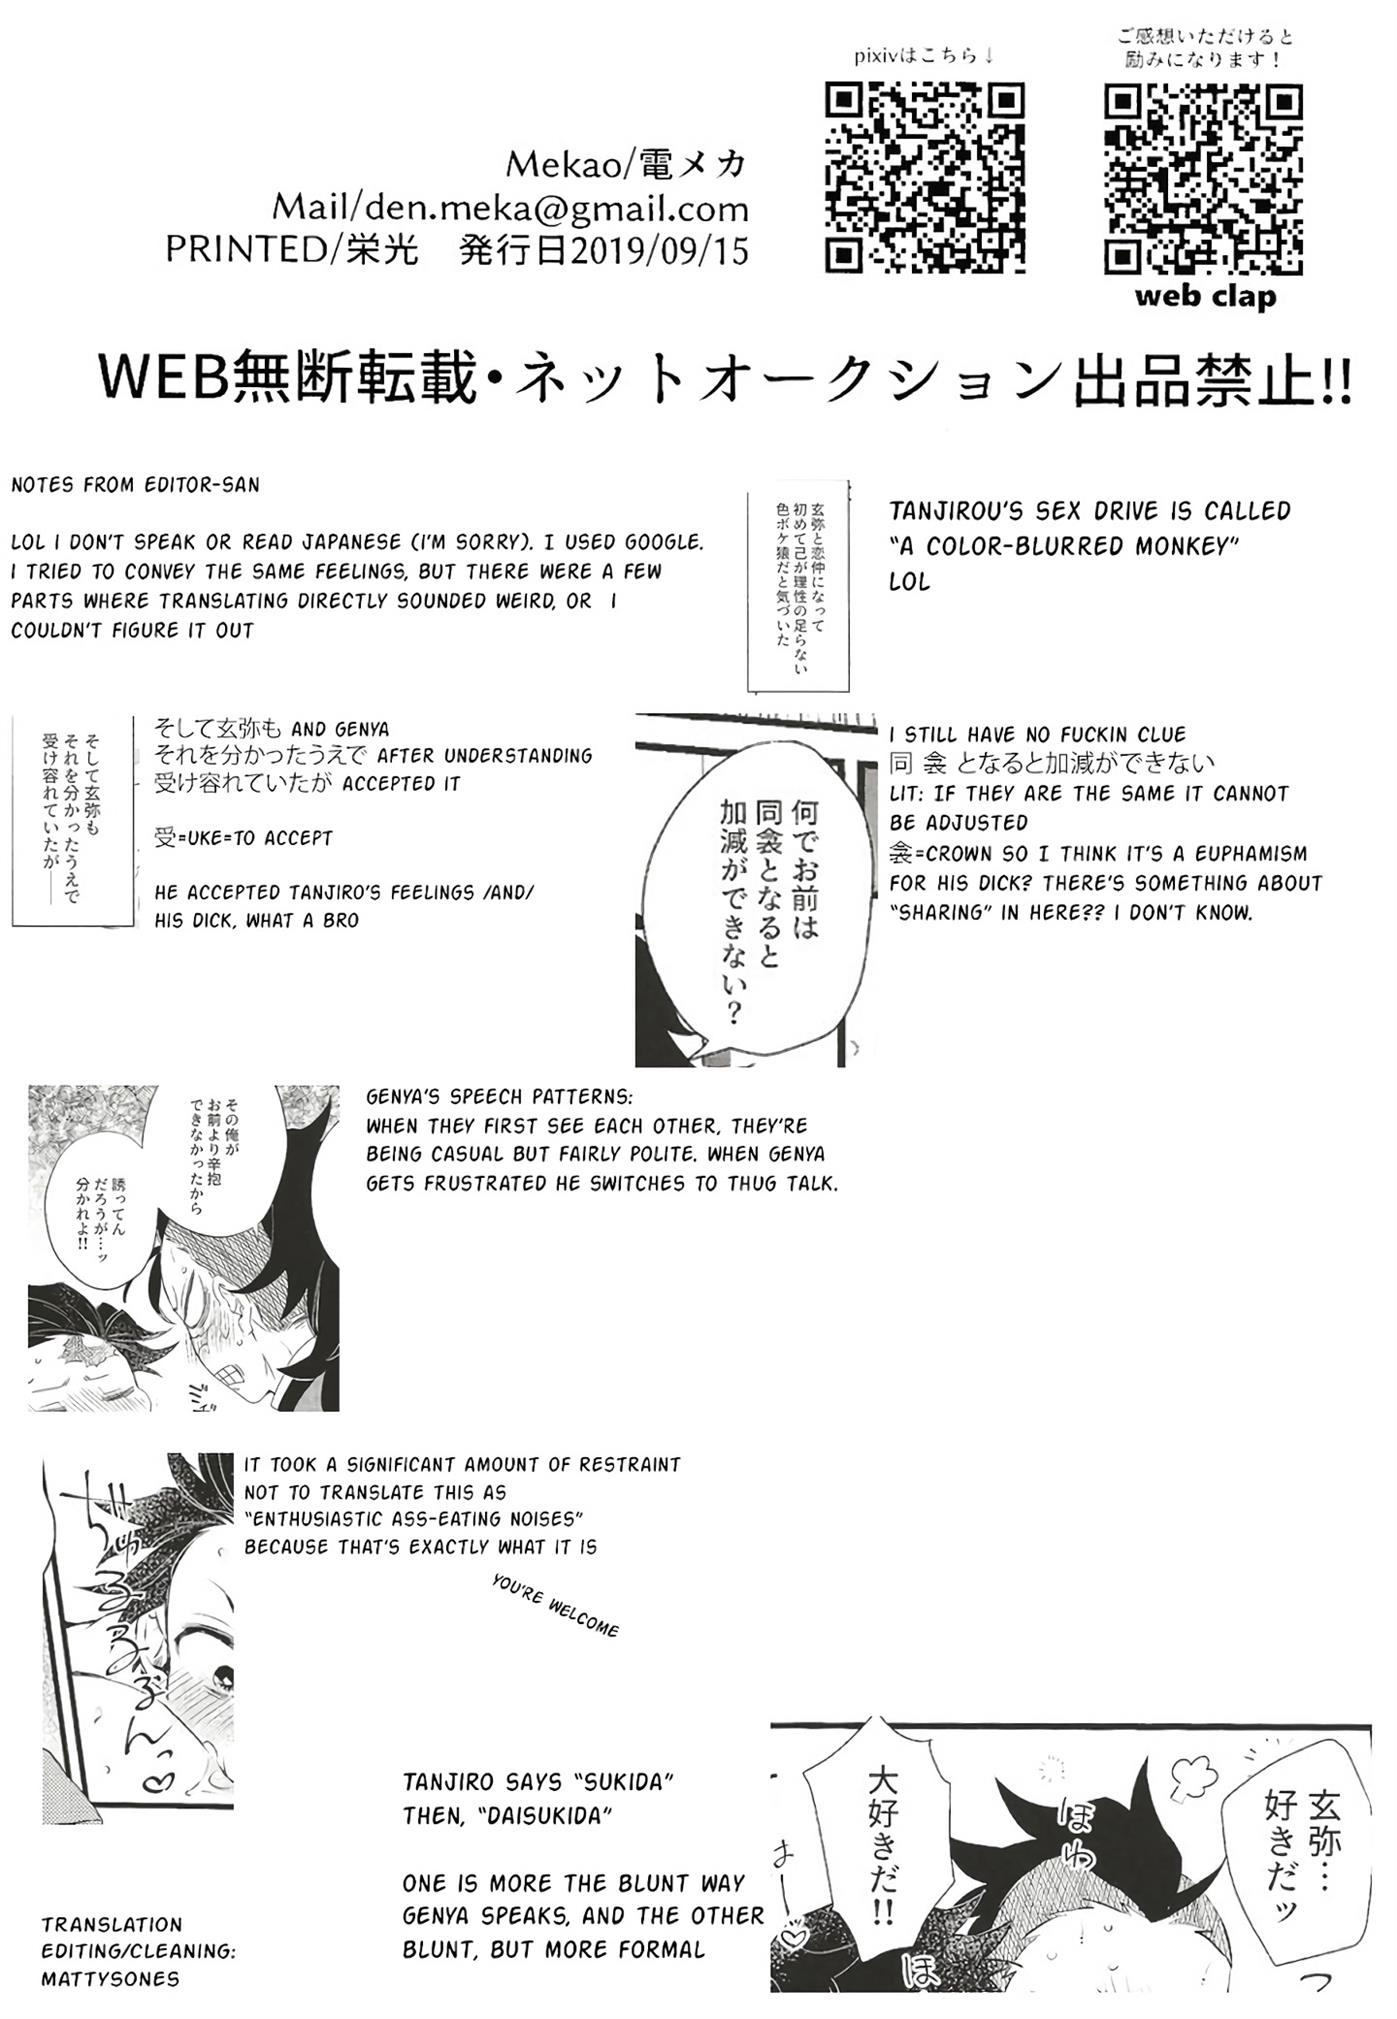 Doujinshi Hentai Gay Demon Slayer - Foto 21